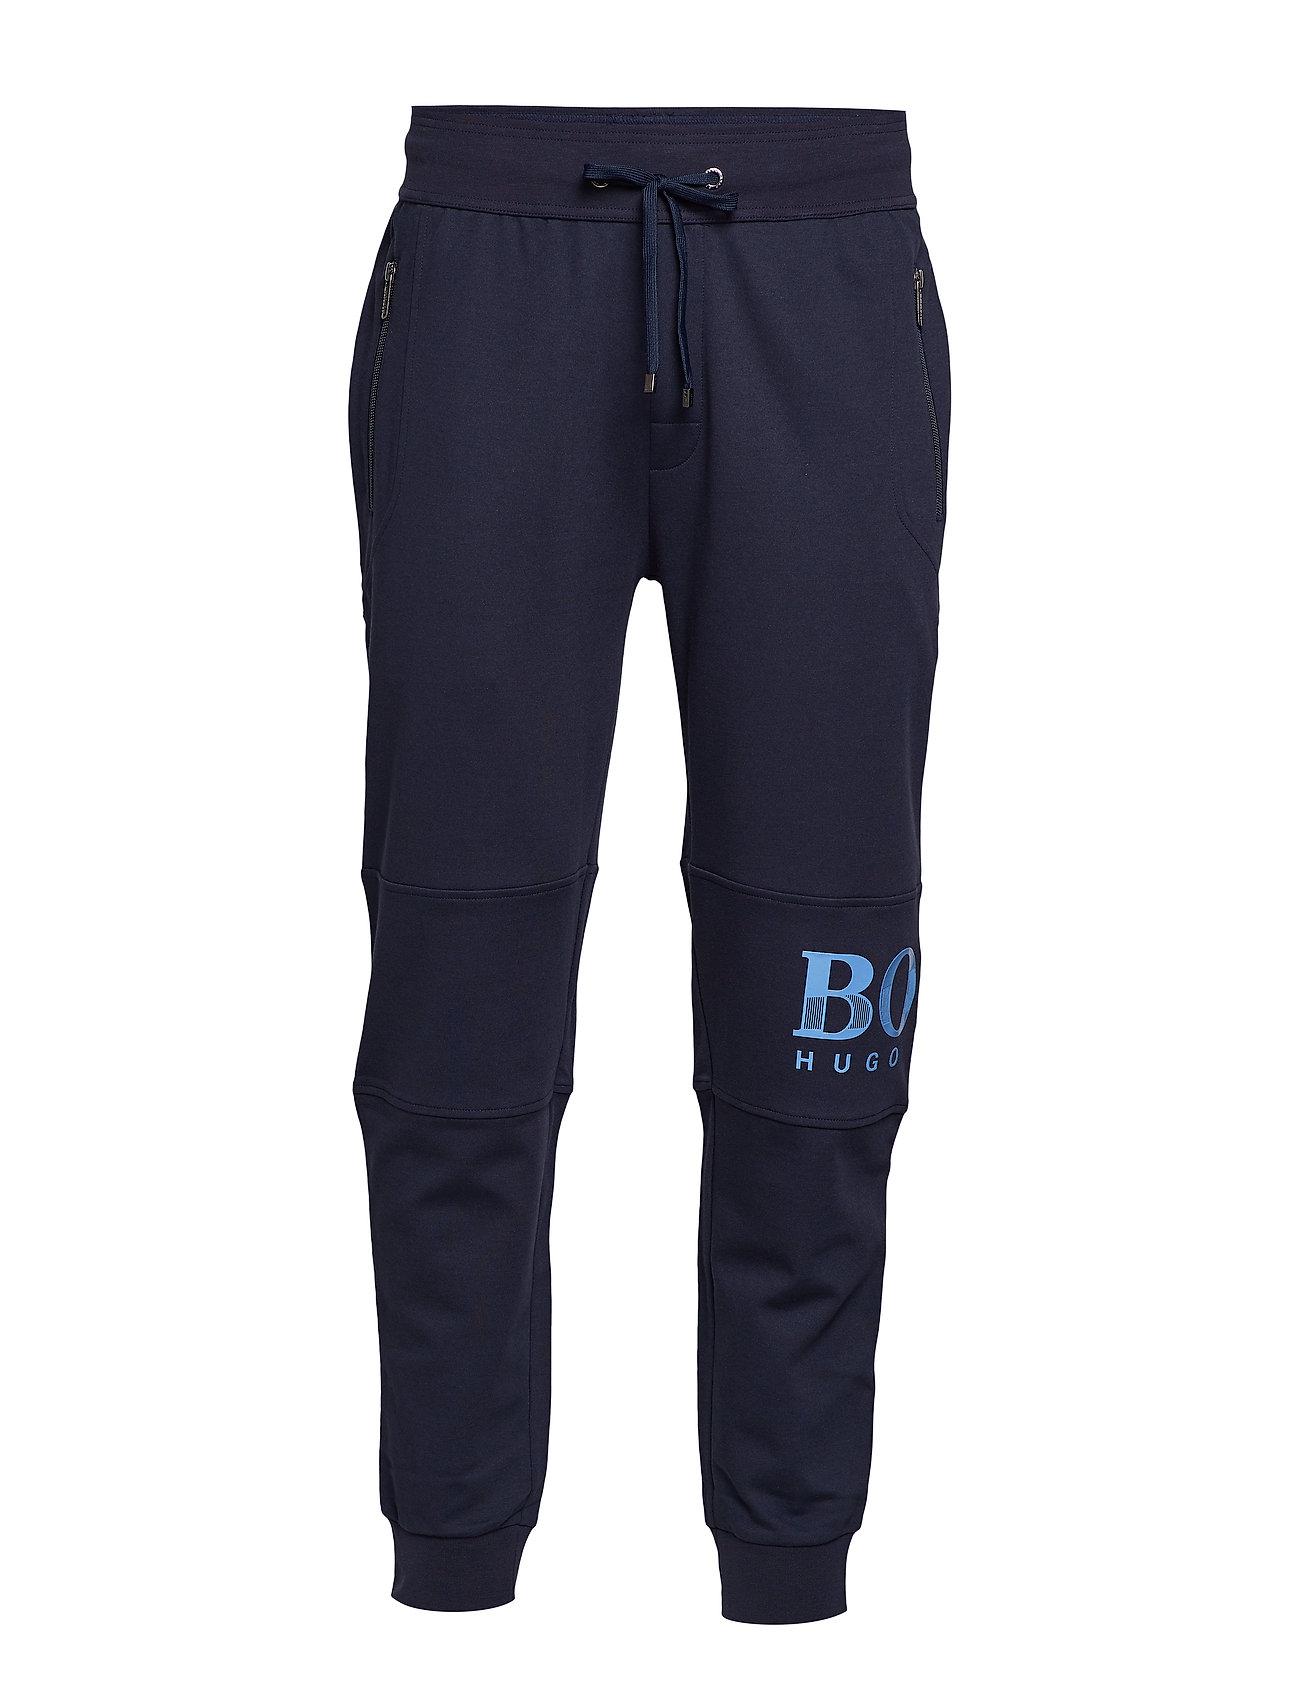 BOSS Business Tracksuit Pants - DARK BLUE